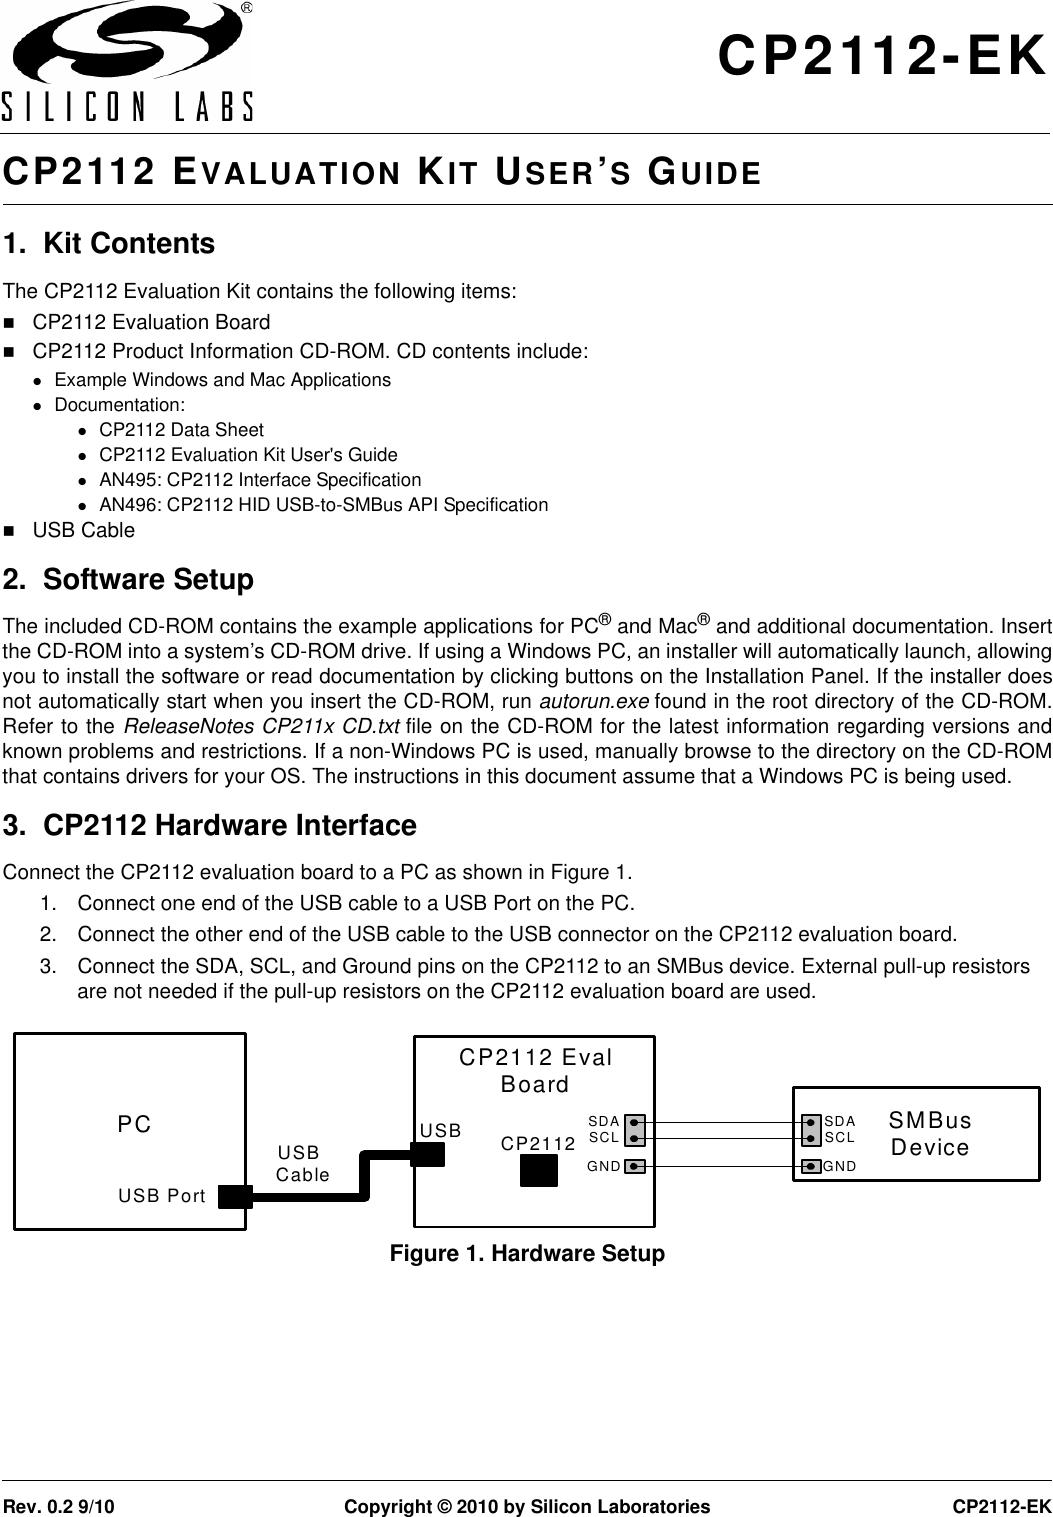 Silicon Laboratories Cp2112 Ek Users Manual Evaluation Kit